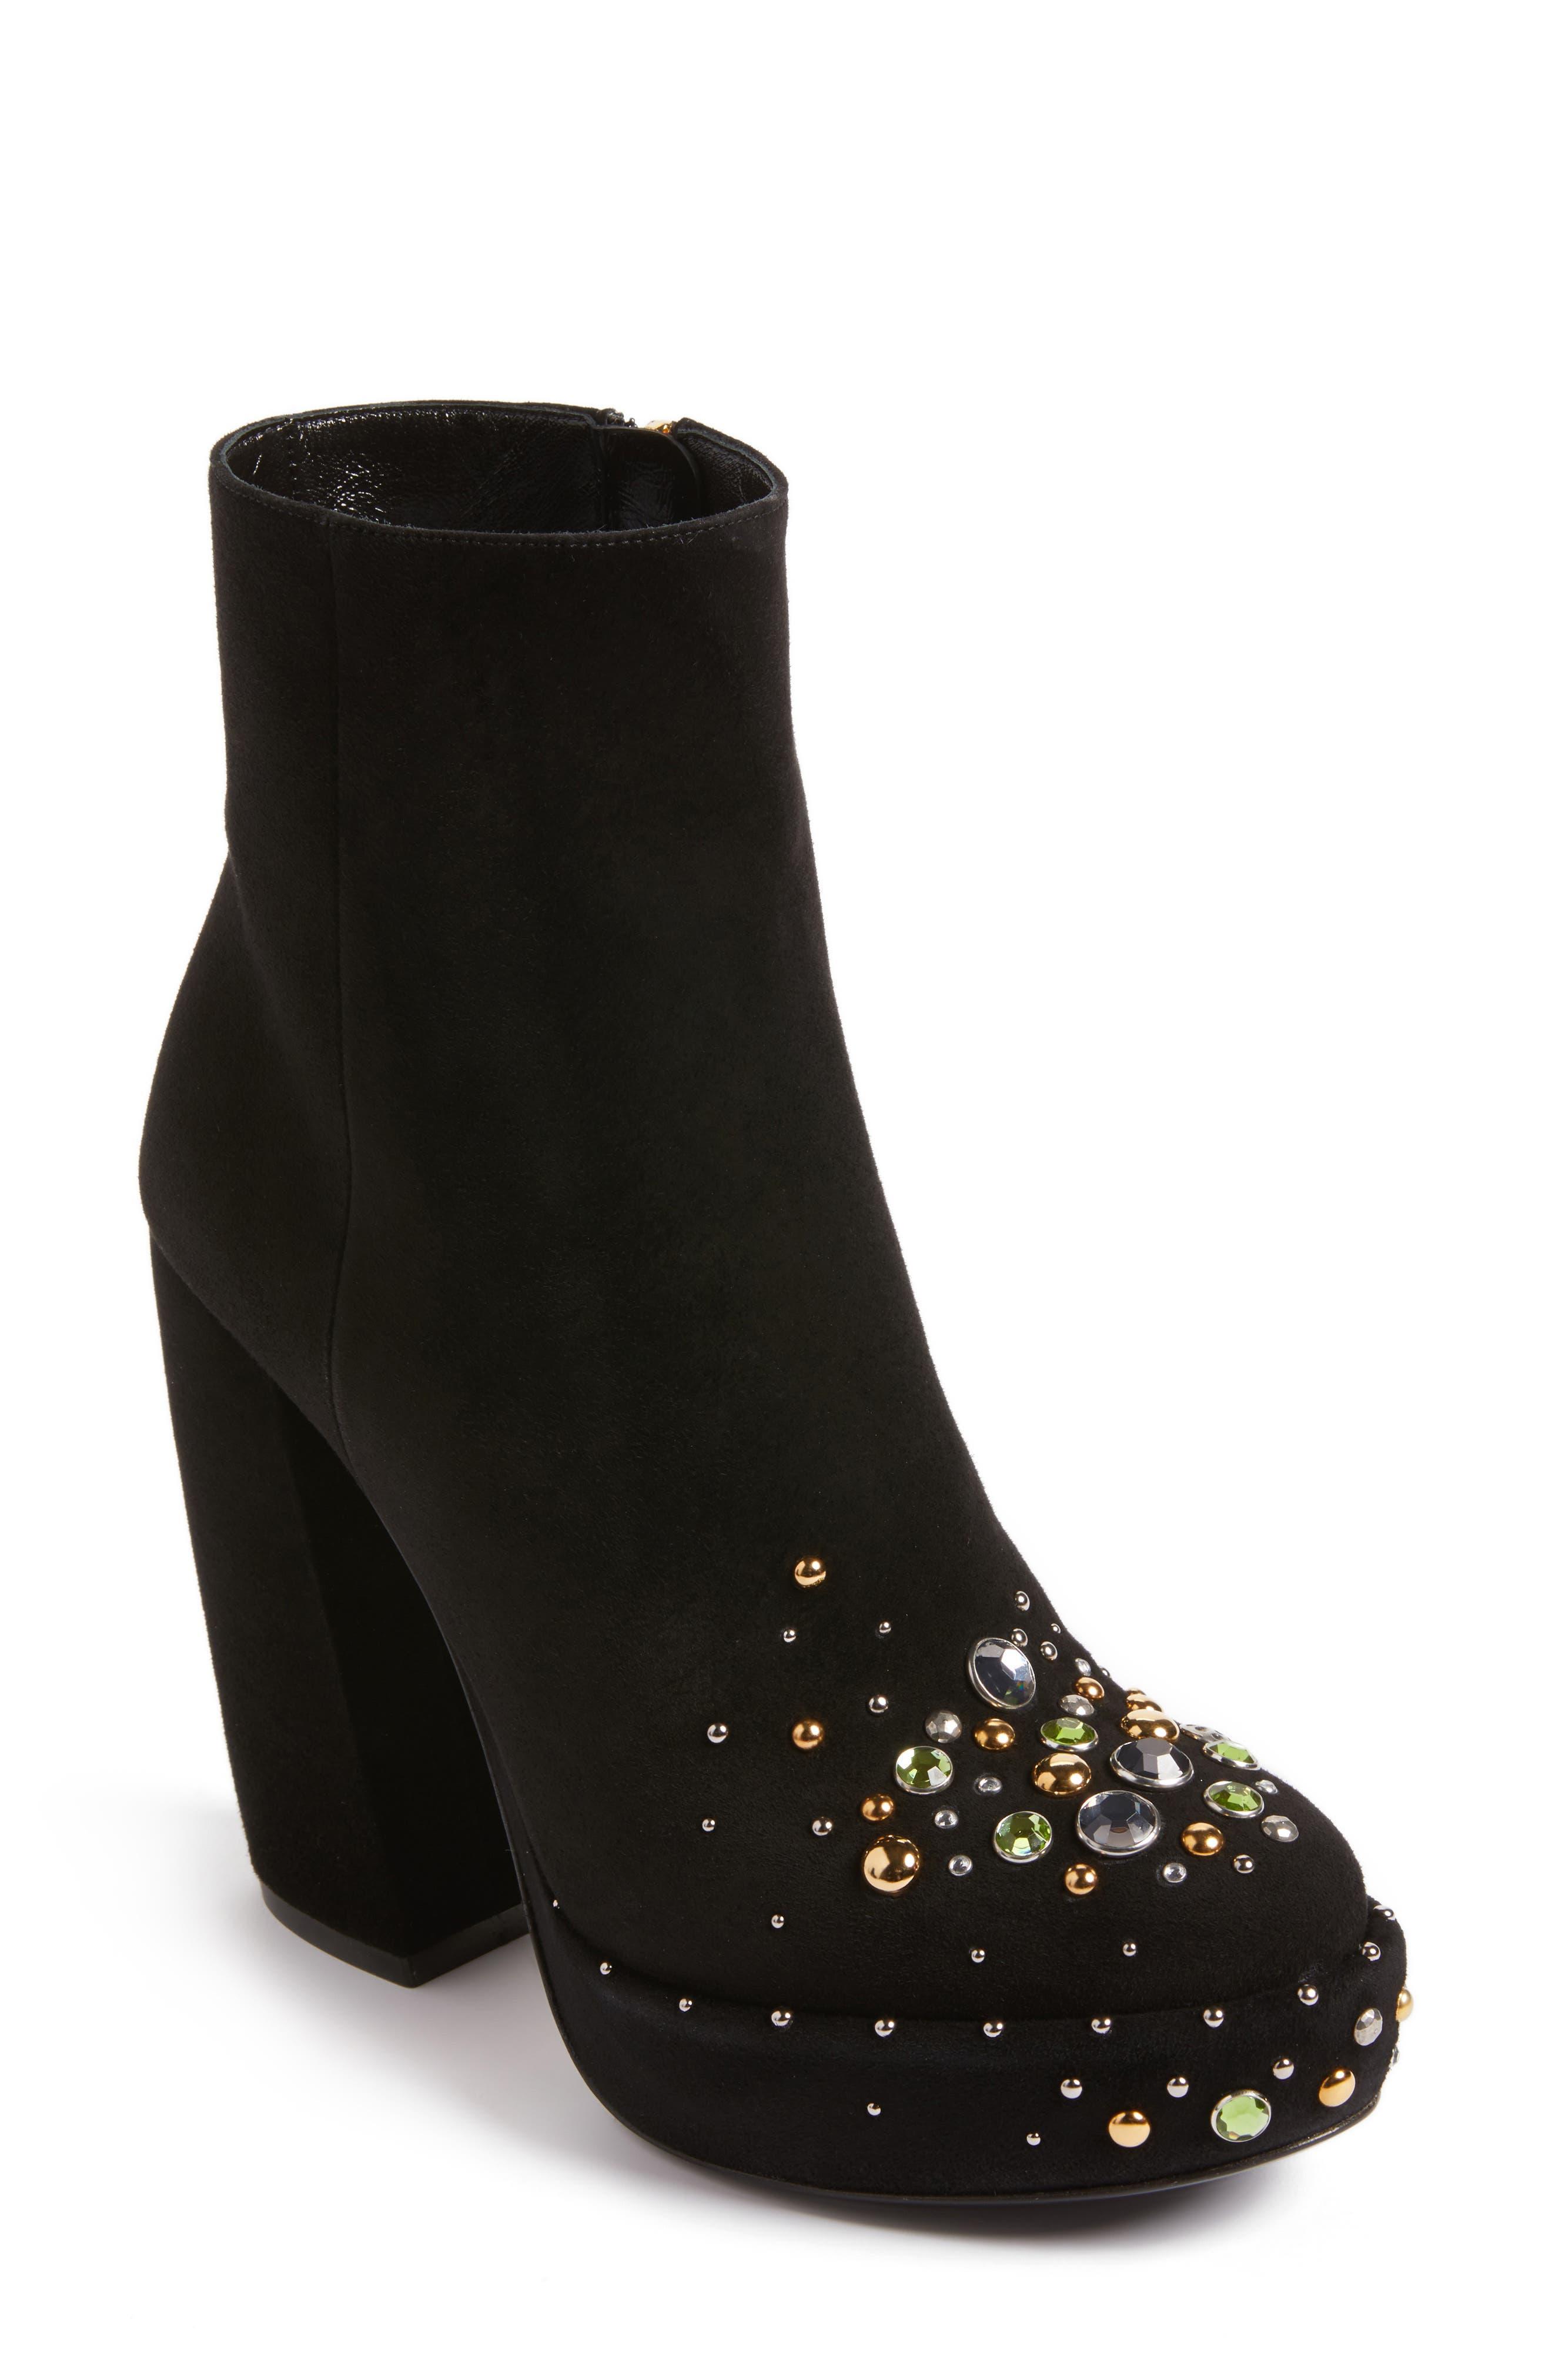 Alternate Image 1 Selected - Prada Embellished Platform Boot (Women)